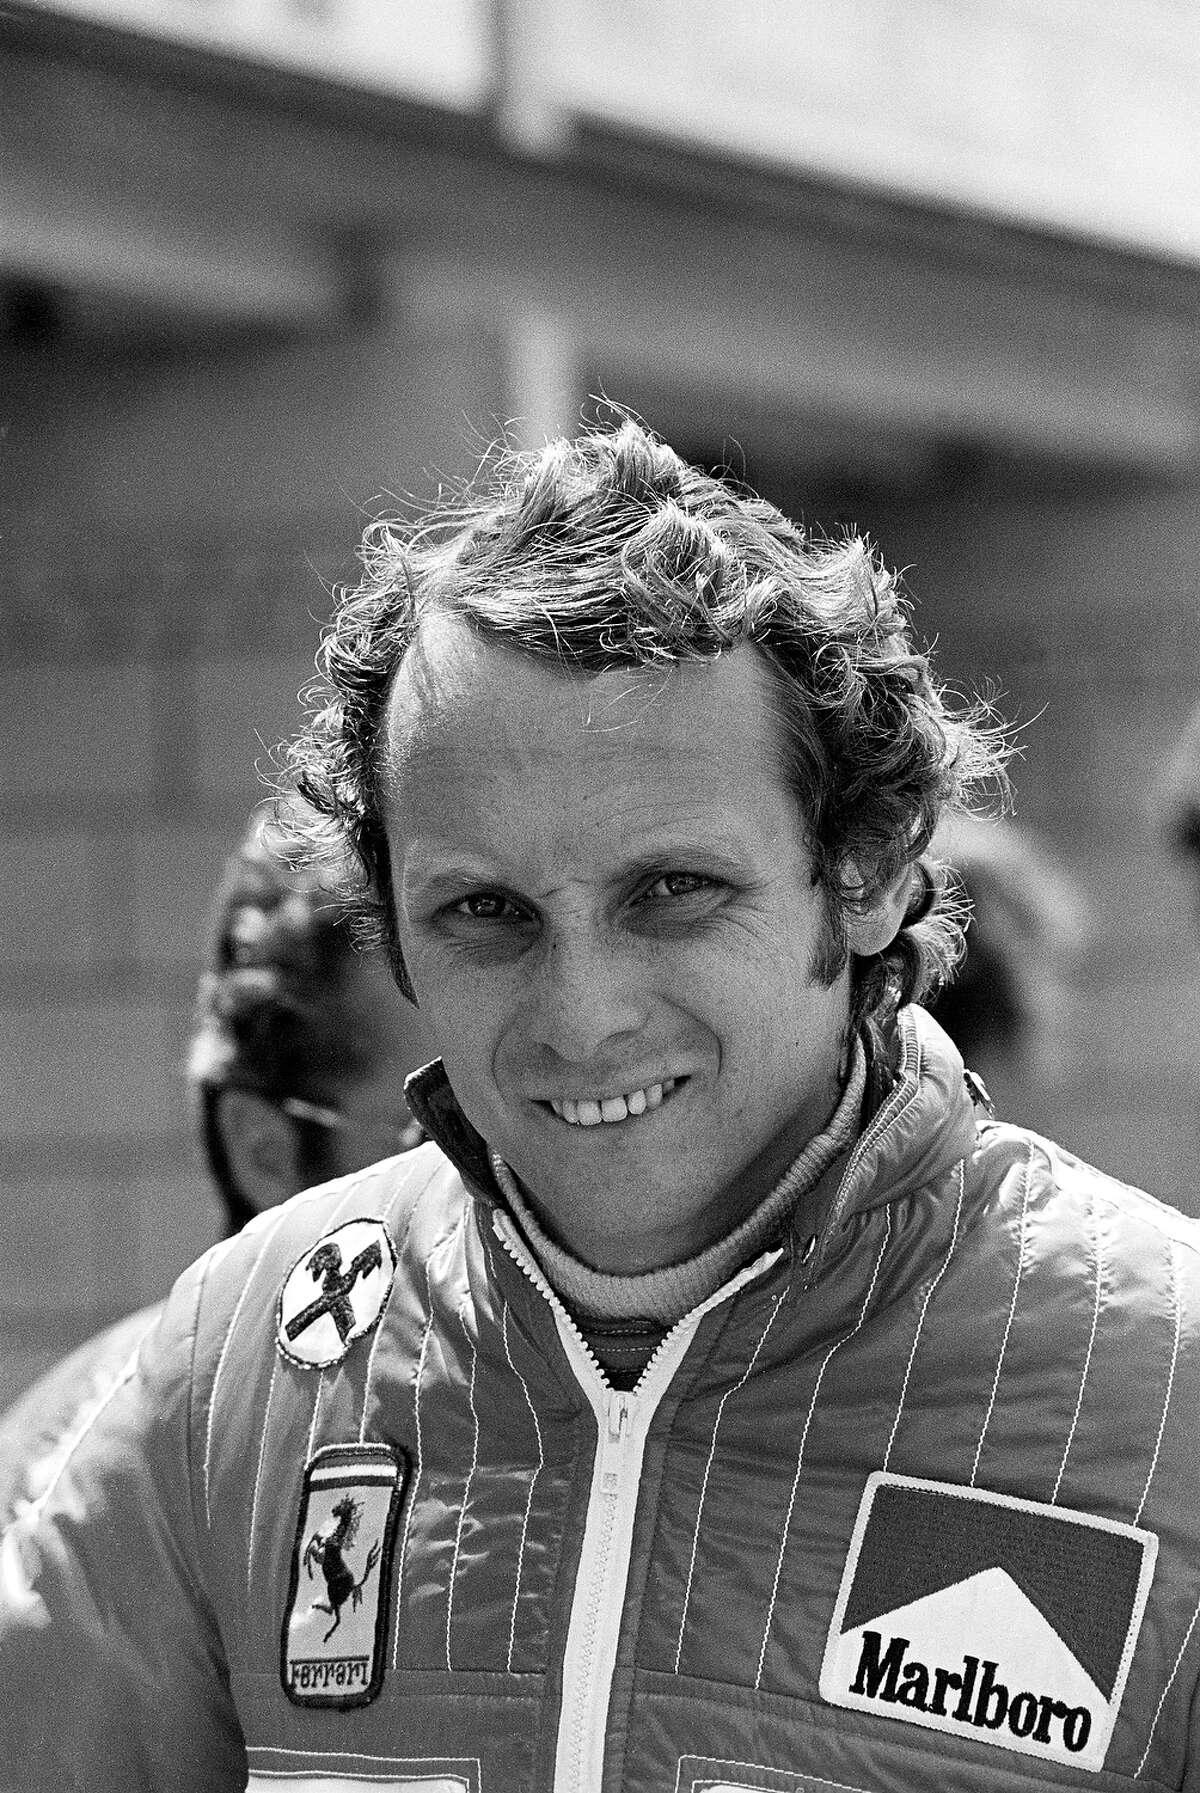 Ferrari driver Niki Lauda before his crash.